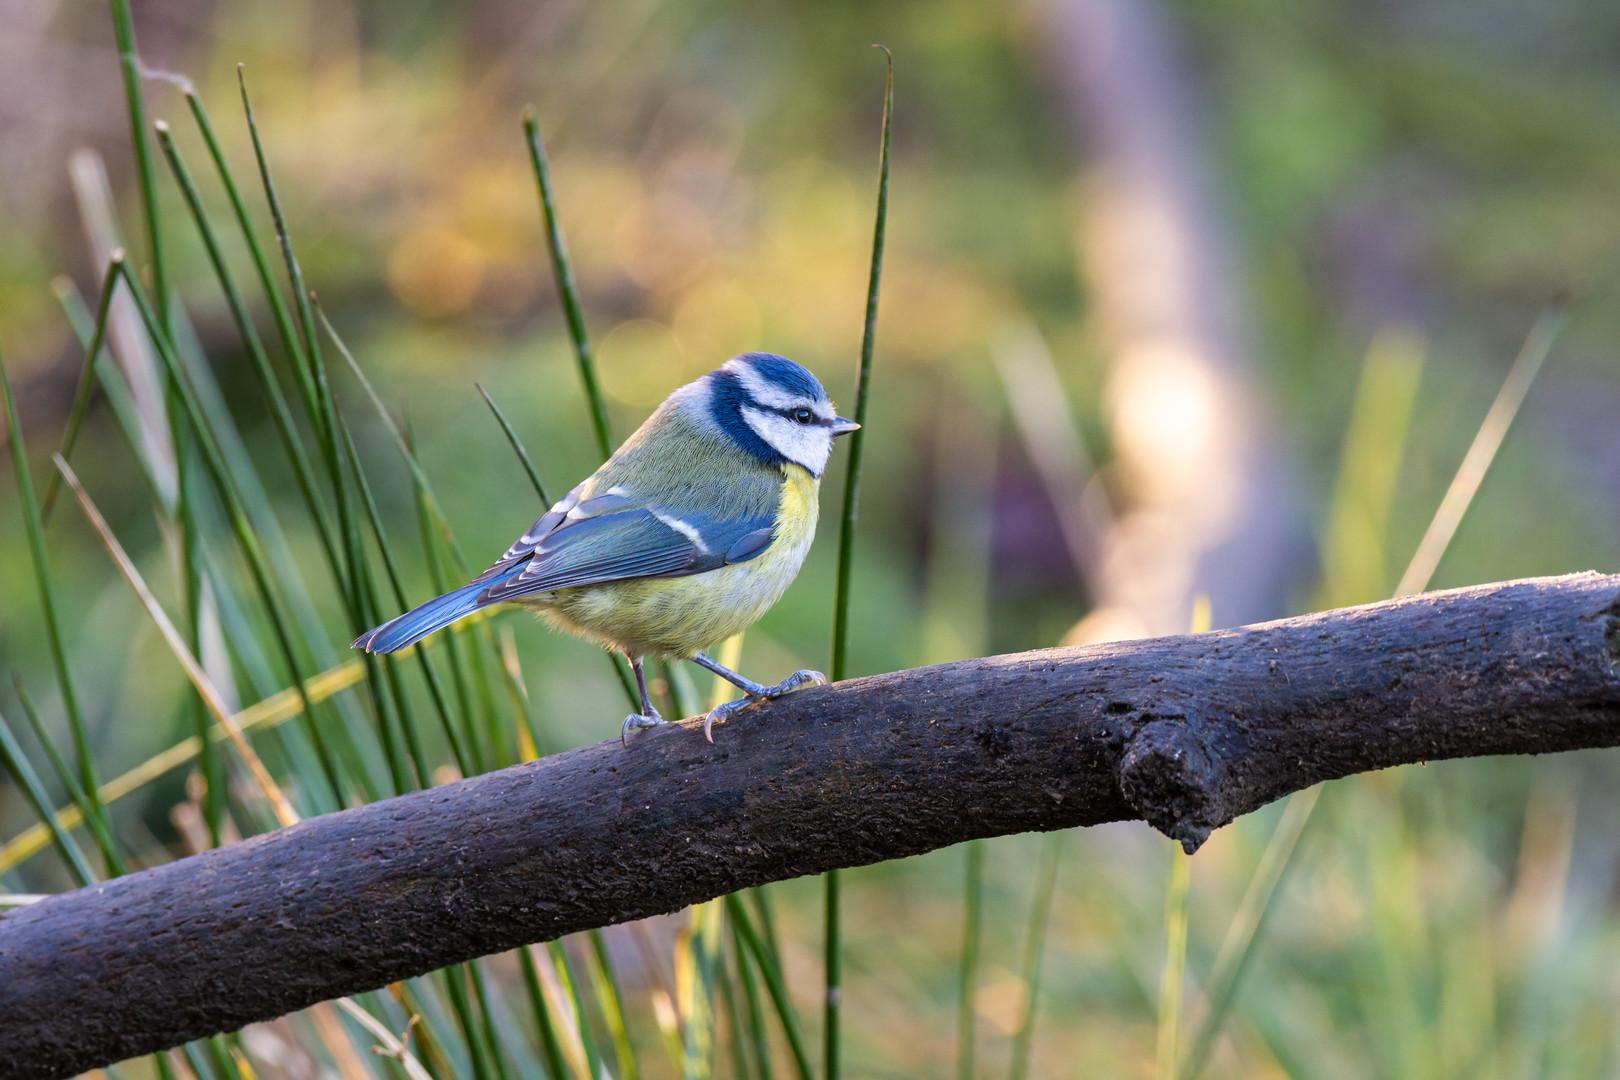 Blue Tit at Adel Dam Nature Reserve, Leeds, West Yorkshire